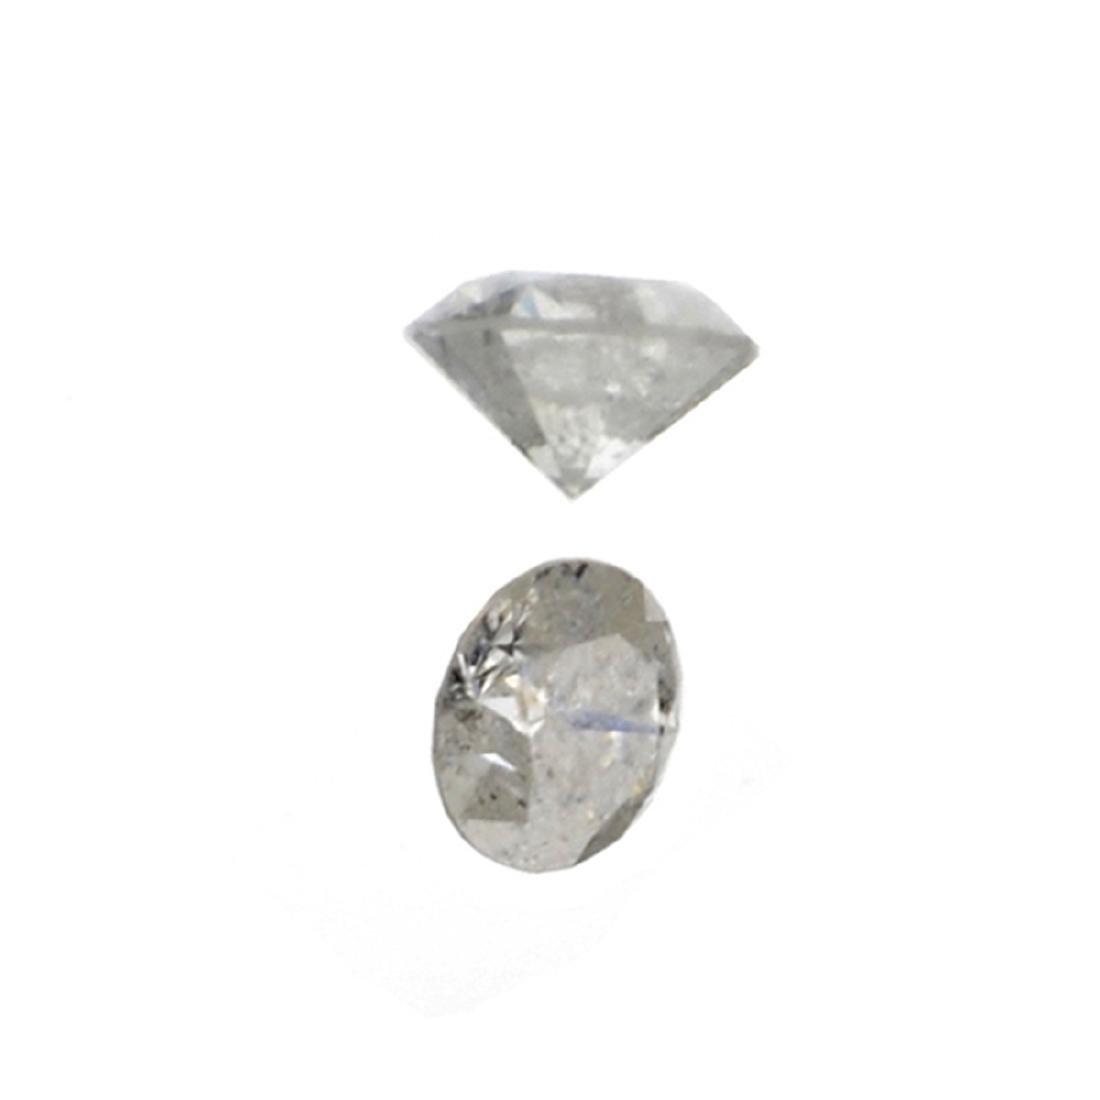 APP: 0.3k Fine Jewelry 0.13CT Round Brilliant Cut